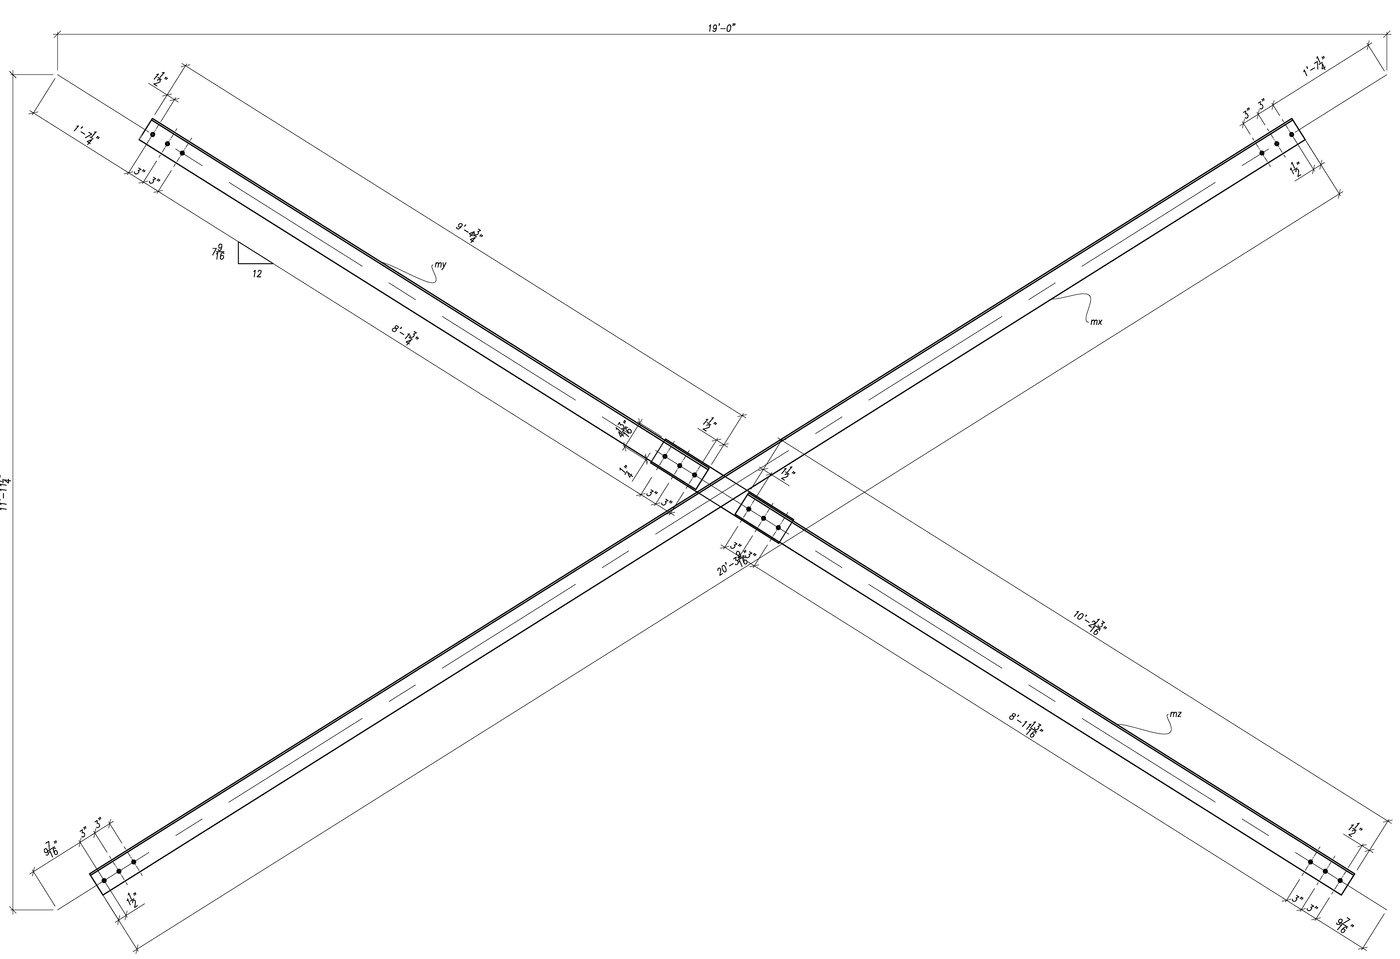 steel plans  u0026 drawings by raymond alberga at coroflot com